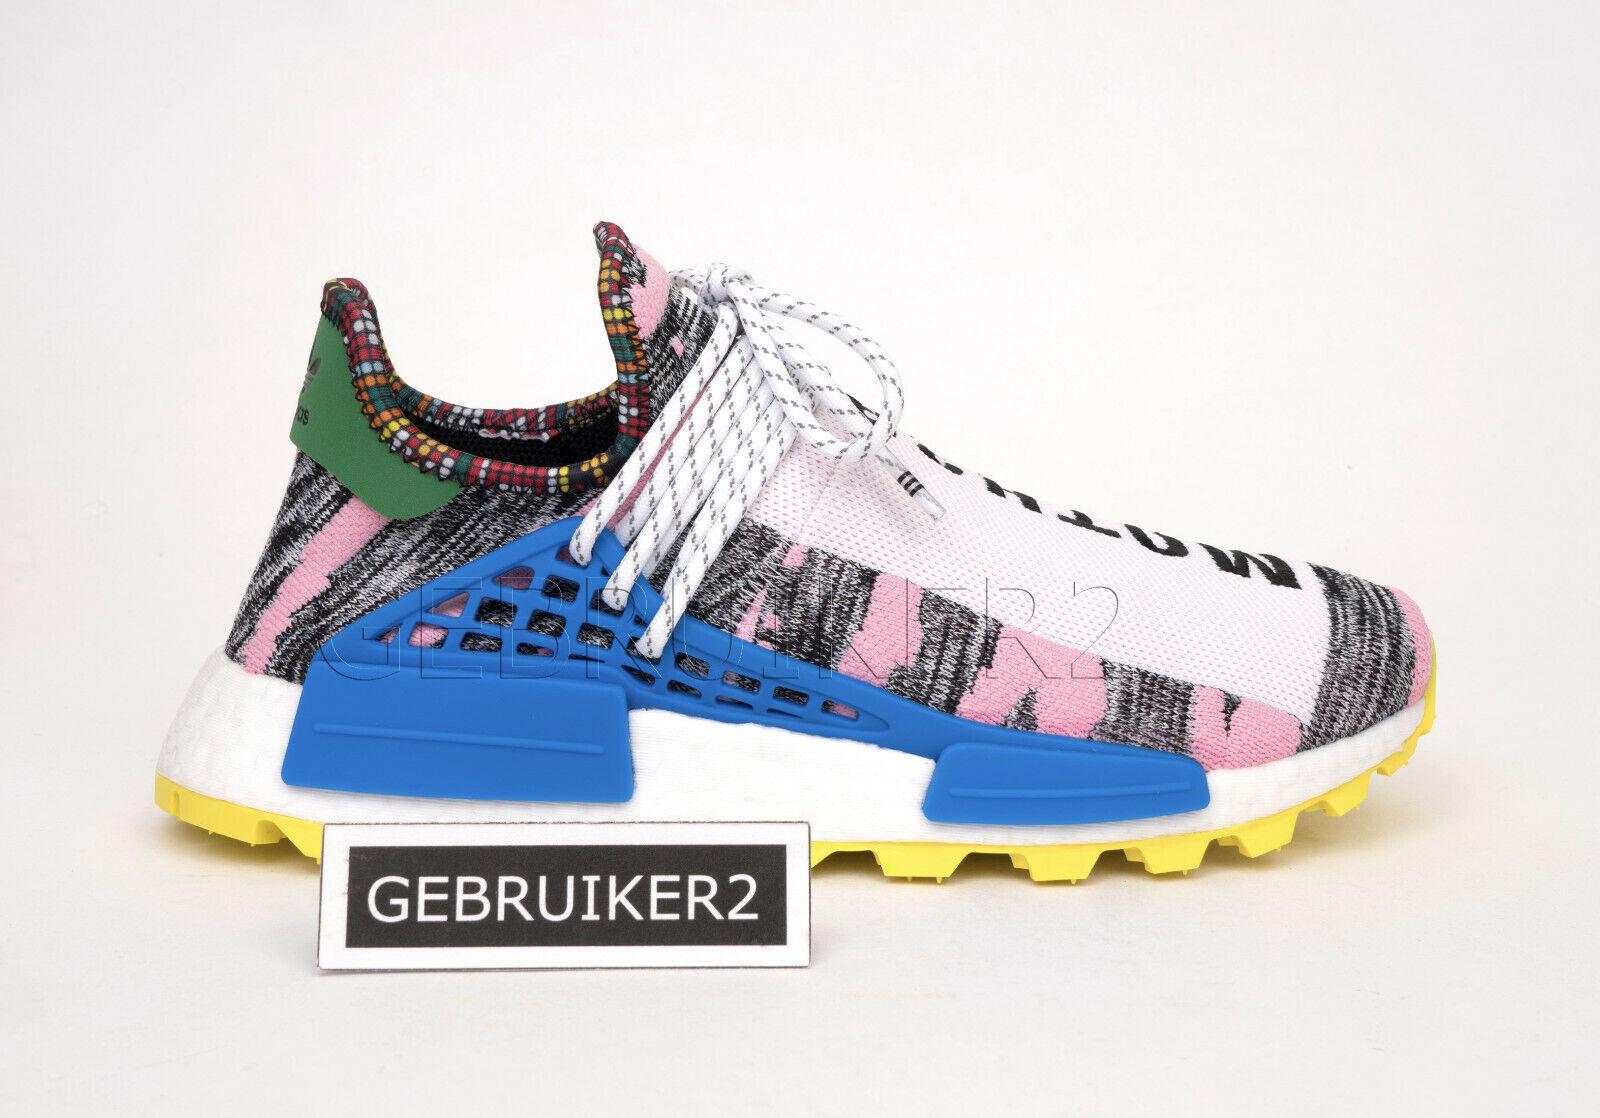 Adidas Originals x Pharrell PW Afro Solar Pack Hu NMD Pink BB9531 Motherland us9